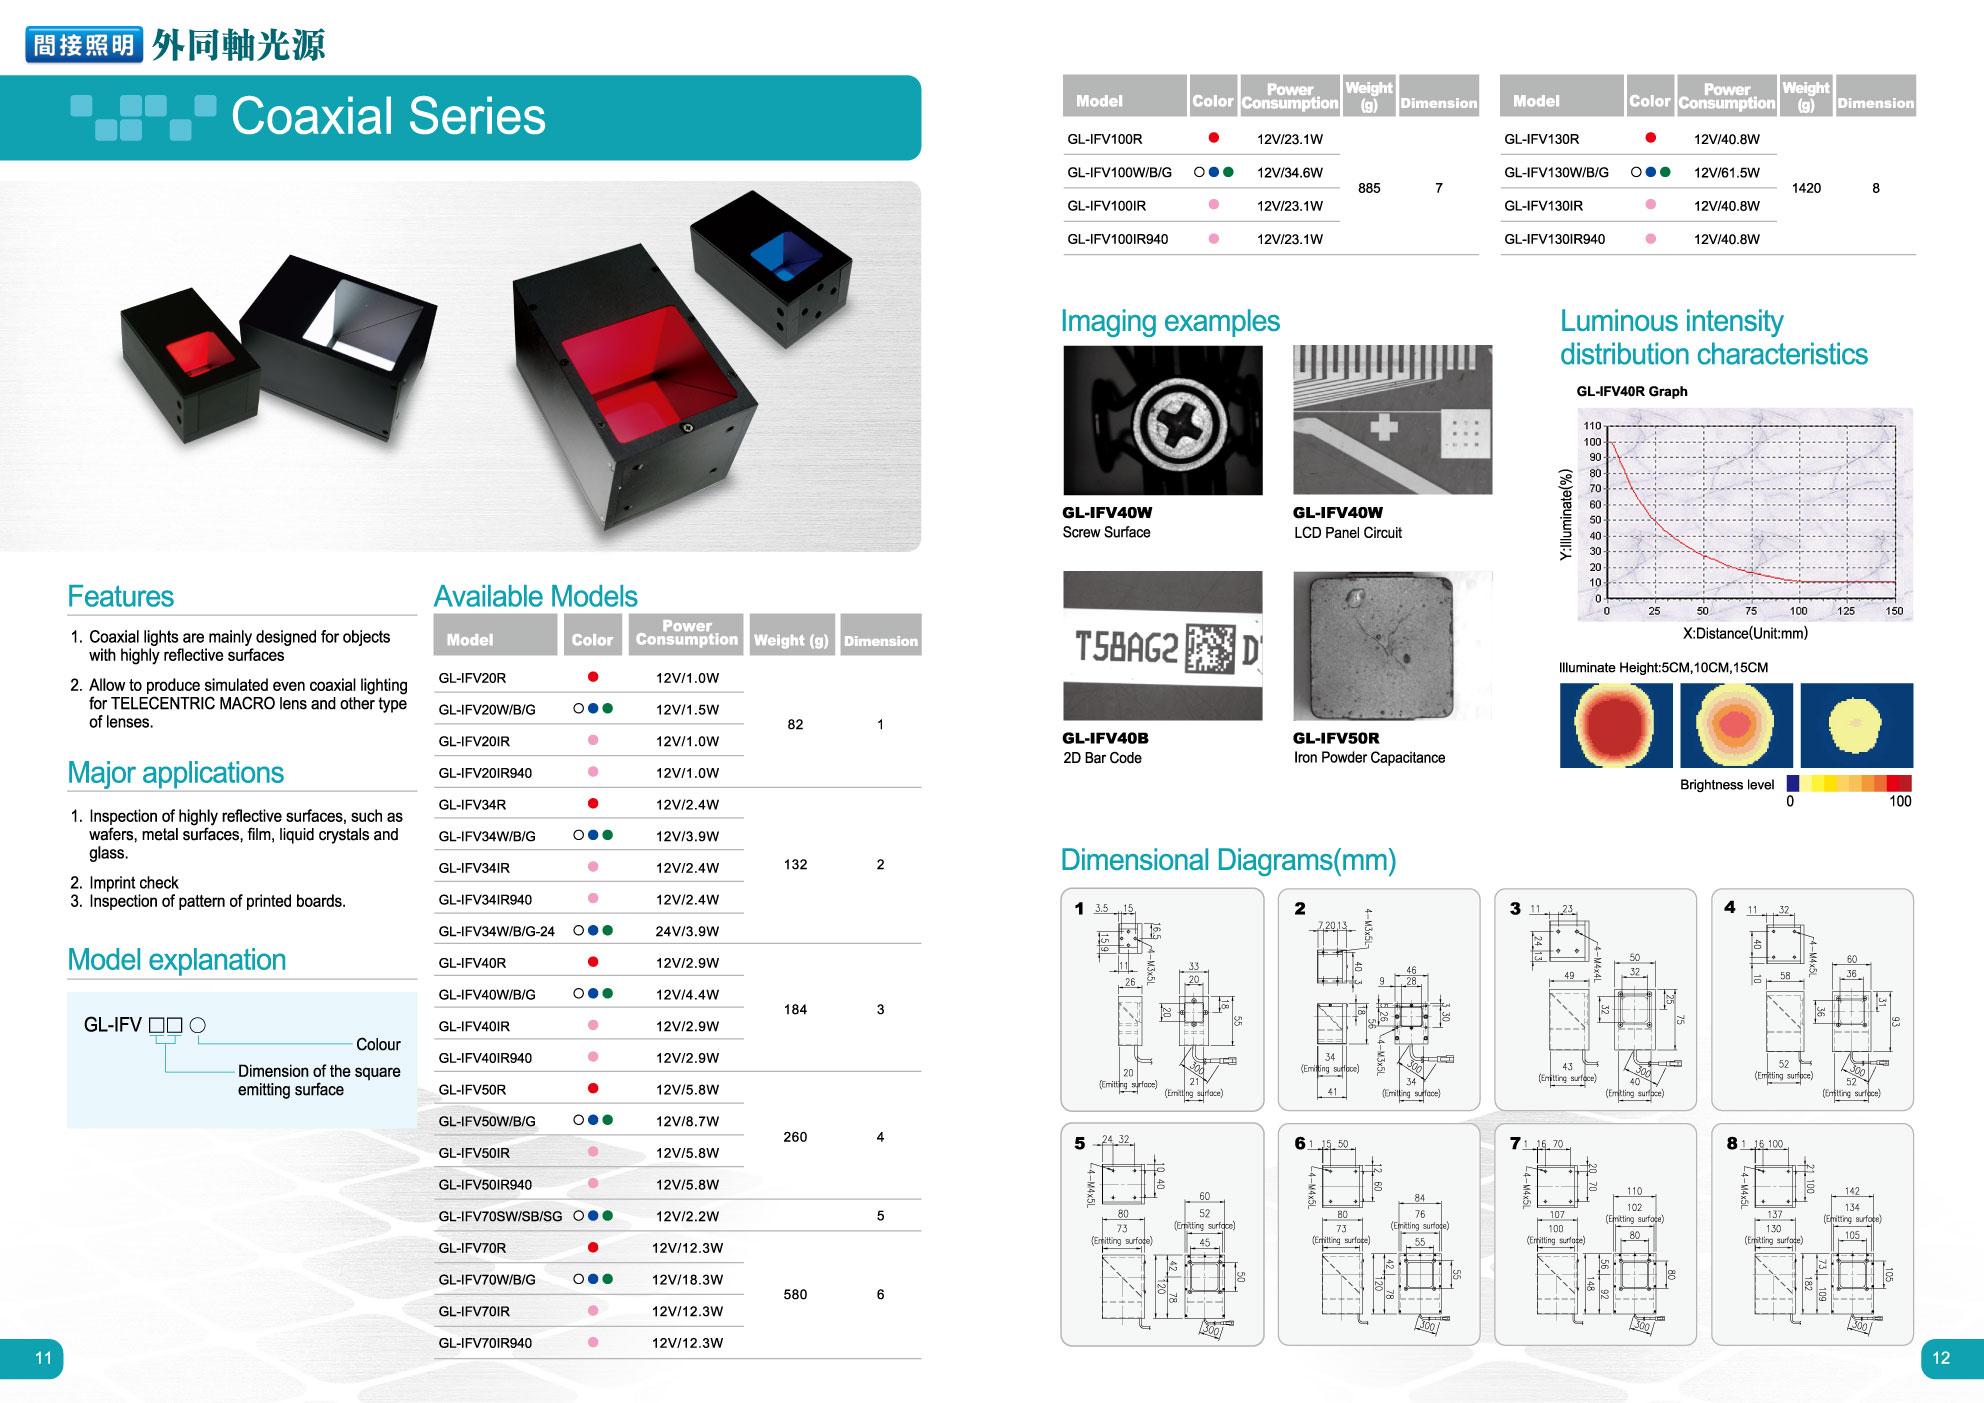 Attachment  sc 1 st  3a mechatronic co. ltd. & Machine Vision Lighting / Illumination for AOI Inpection System ... azcodes.com